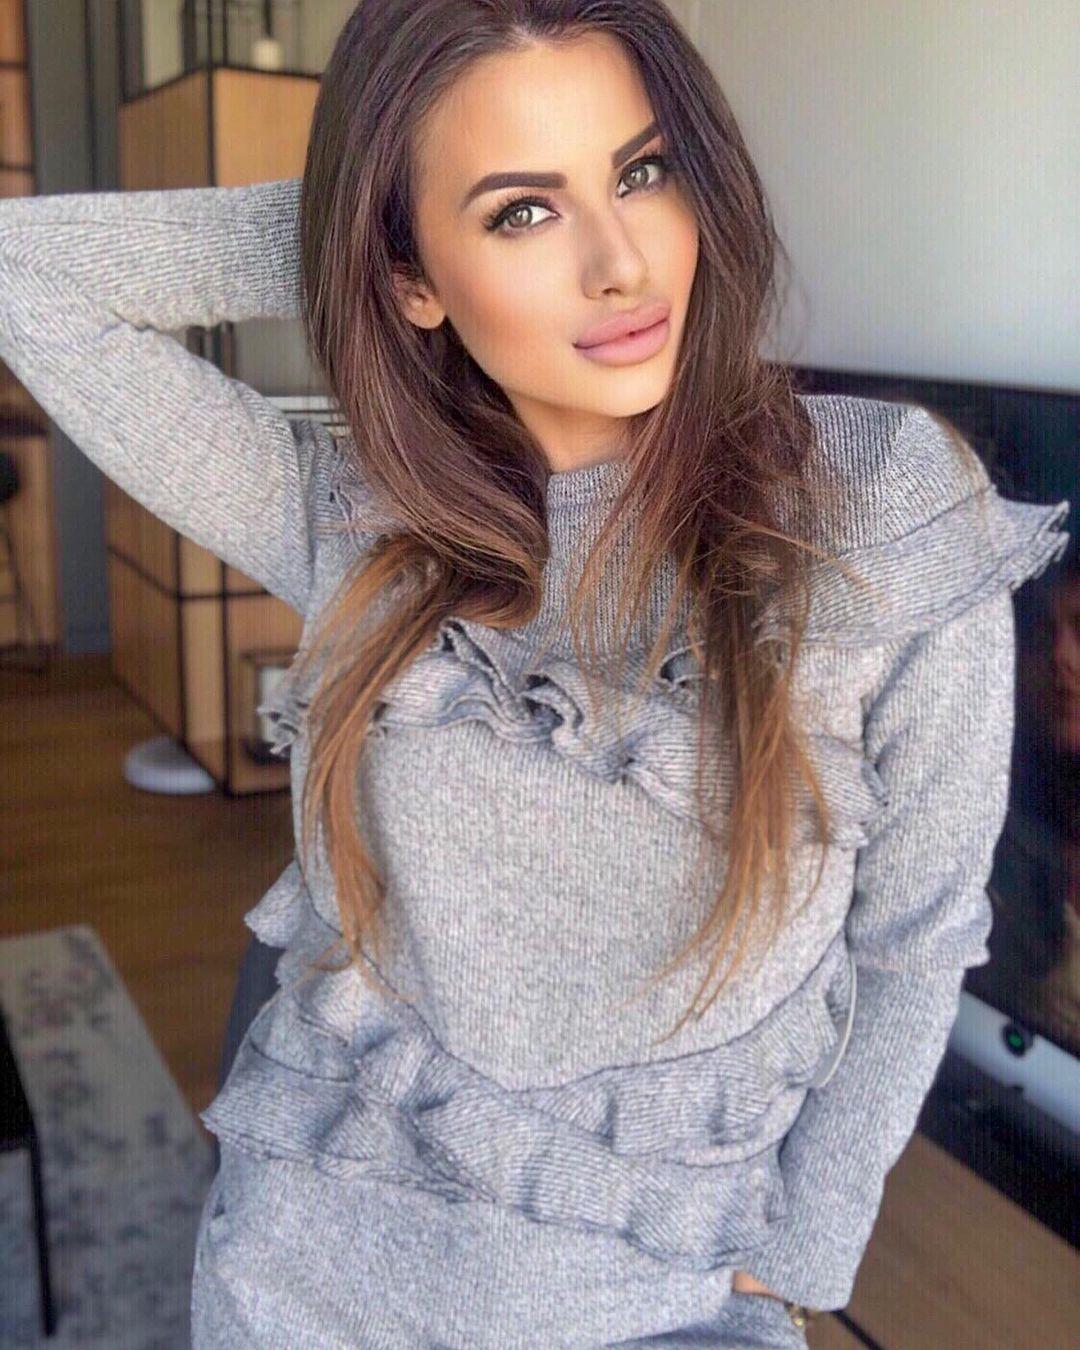 Paulina-Mai-Wallpapers-Insta-Fit-Bio-6